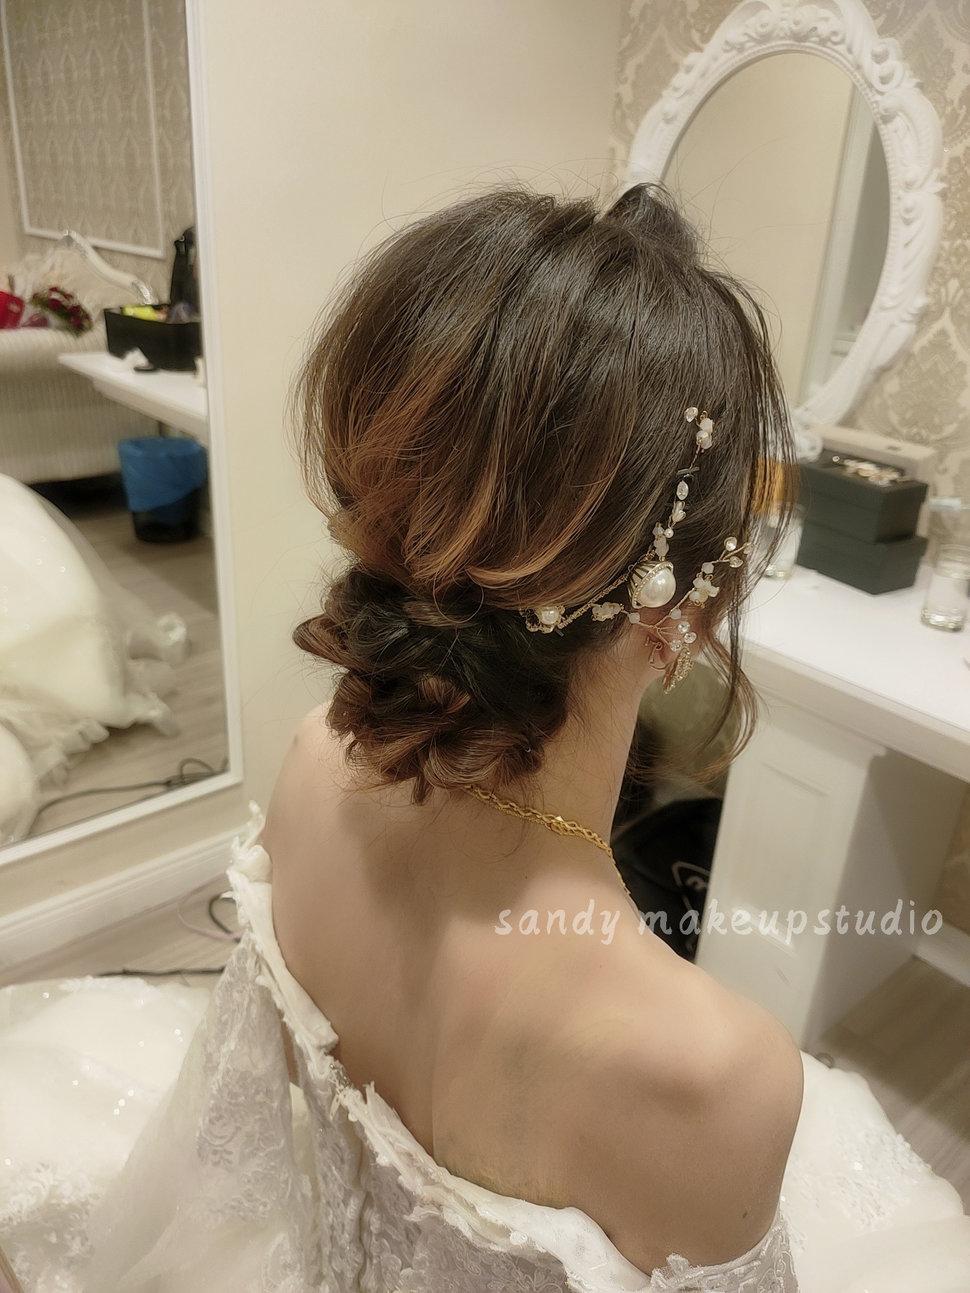 21-01-25-22-58-57-443_deco - 基隆台北全省Sandy新娘秘書《結婚吧》